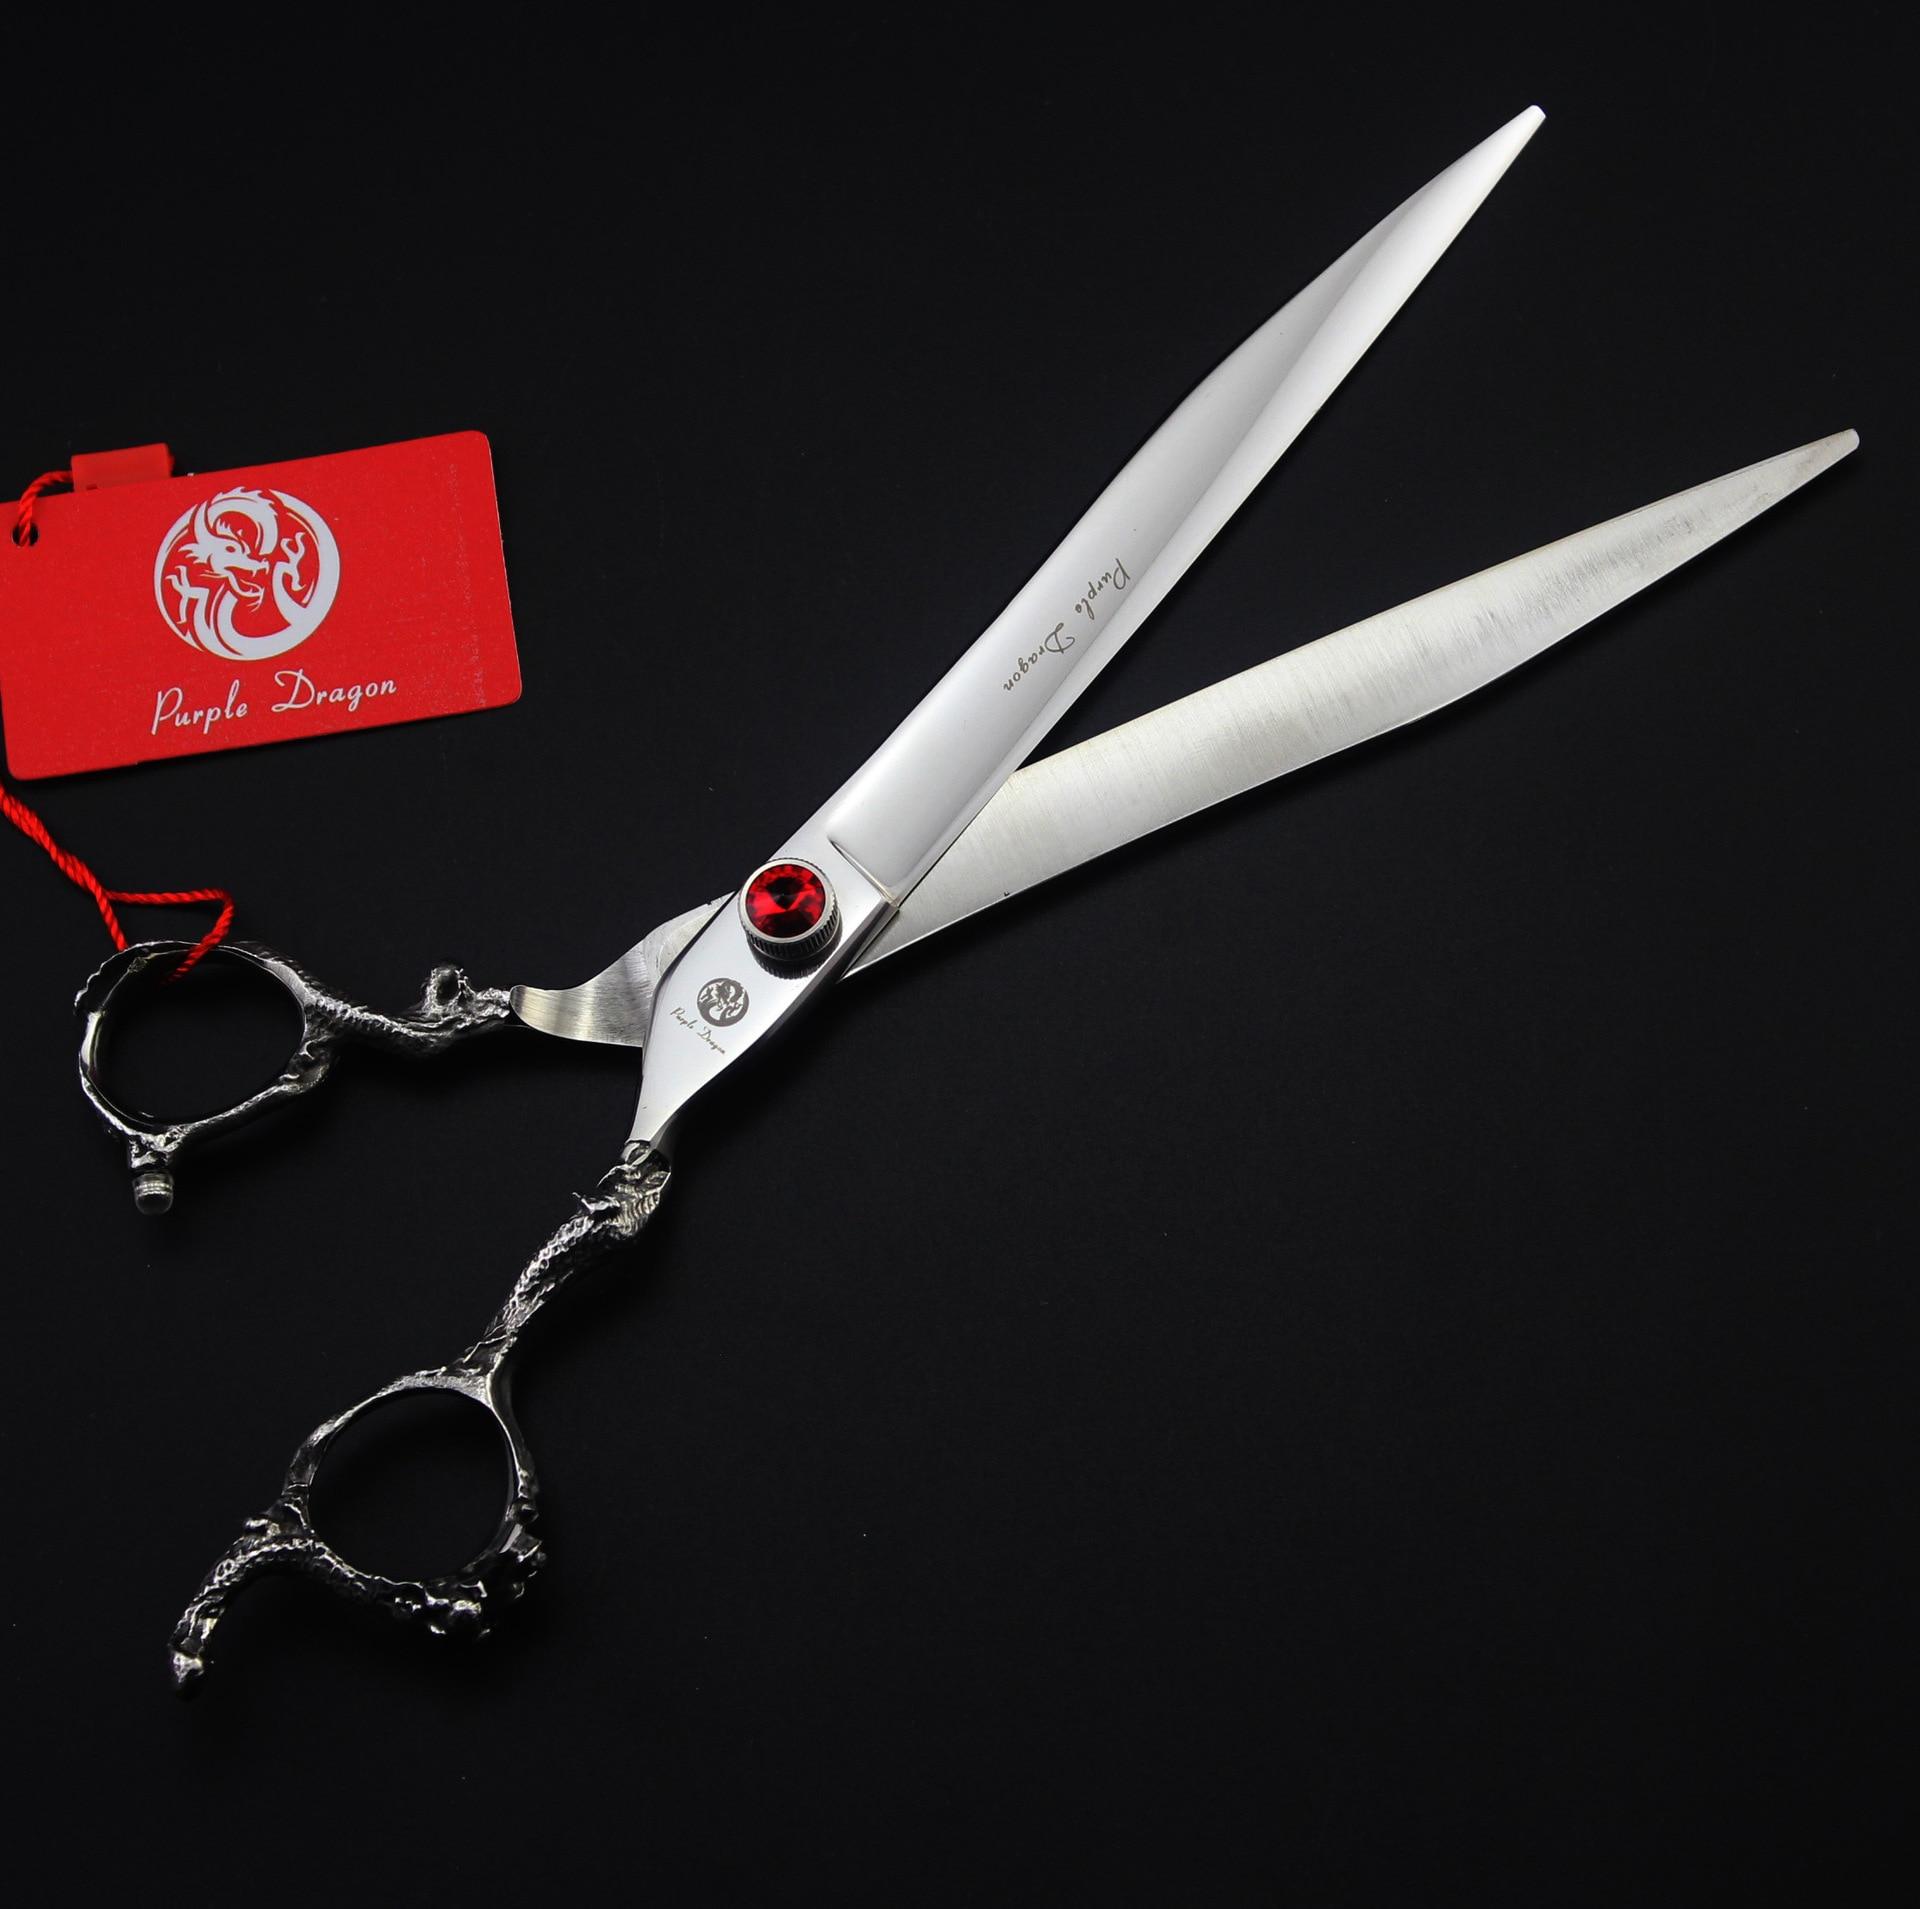 Здесь продается  440C: 8 inch long handle imports of high-end professional pet beauty scissors scissors to send packets  Красота и здоровье